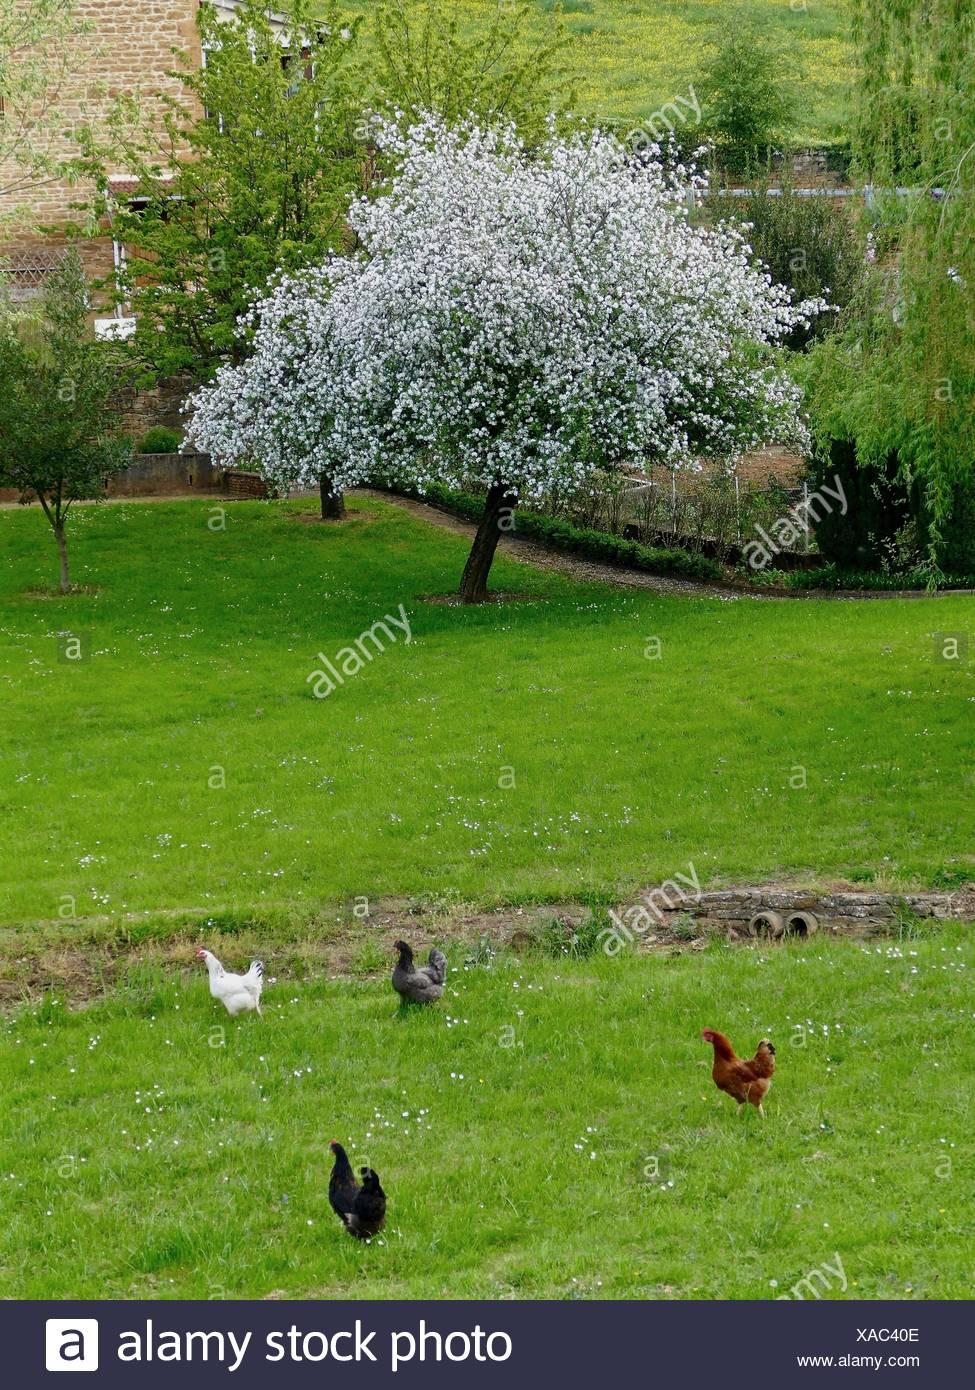 Free Range Chickens In Garden - Stock Image